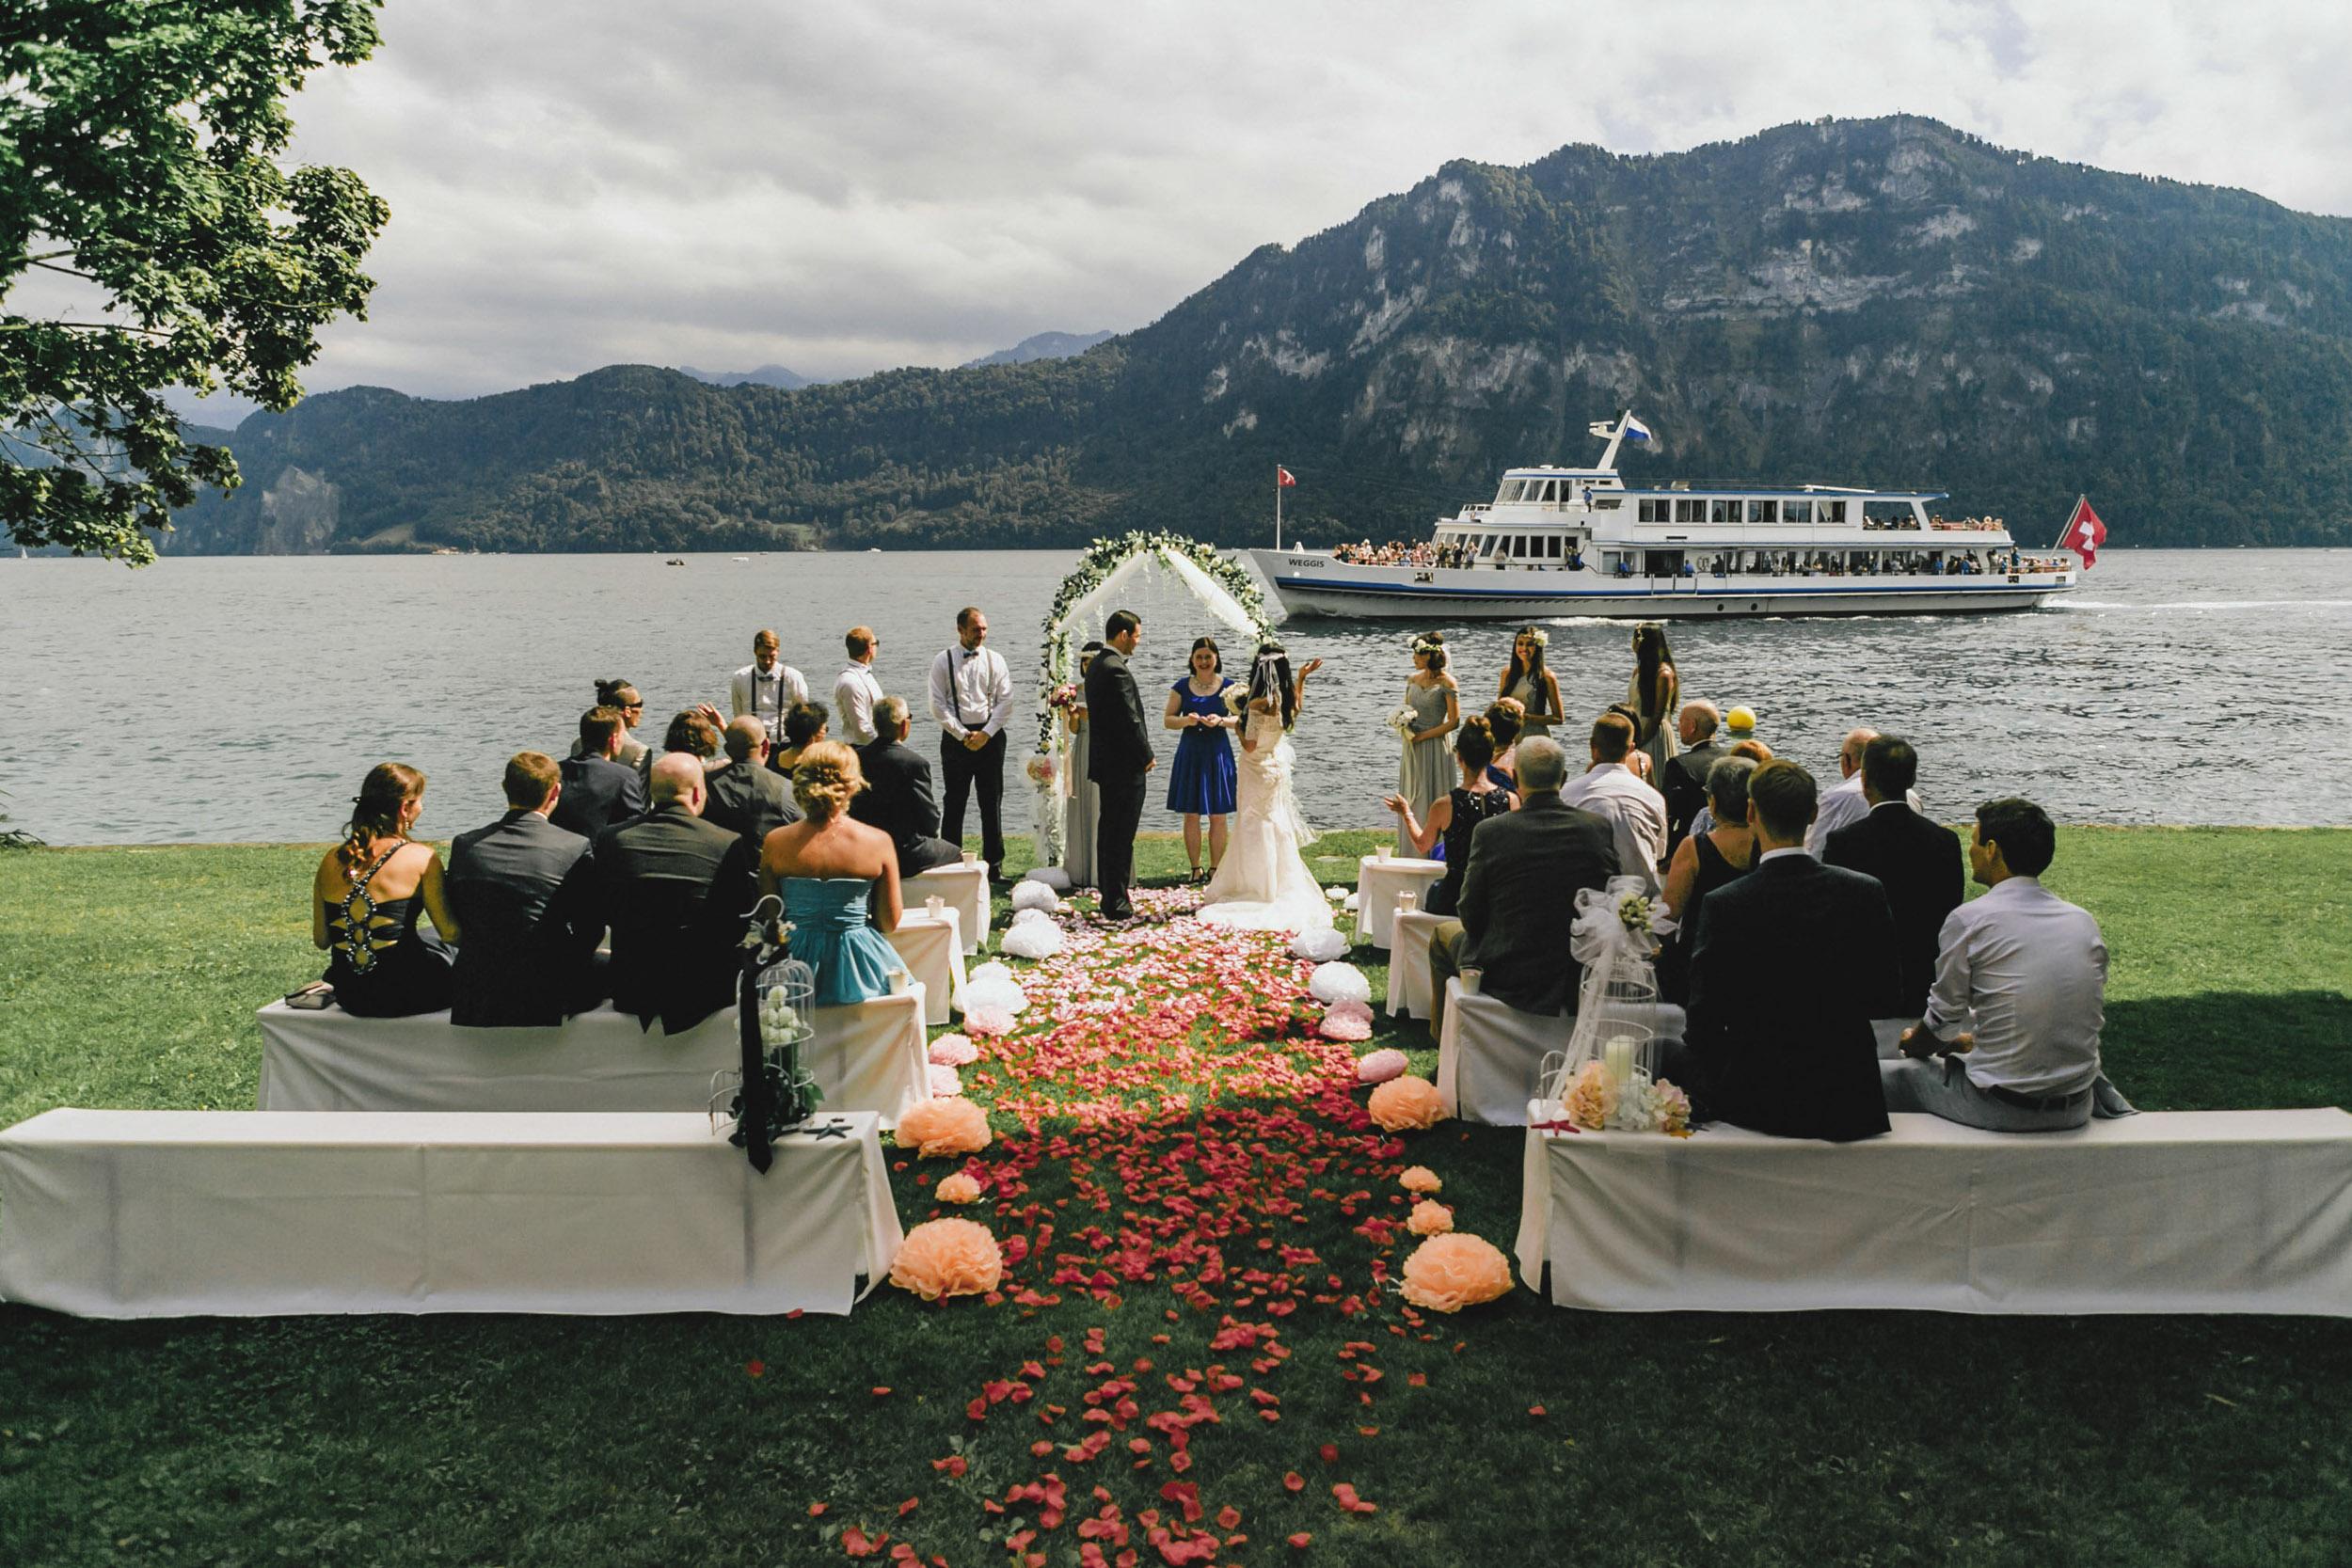 hochzeitsfotografie-schweiz_wedding-photographer-switzerland-europe_Bendik-Photography-023